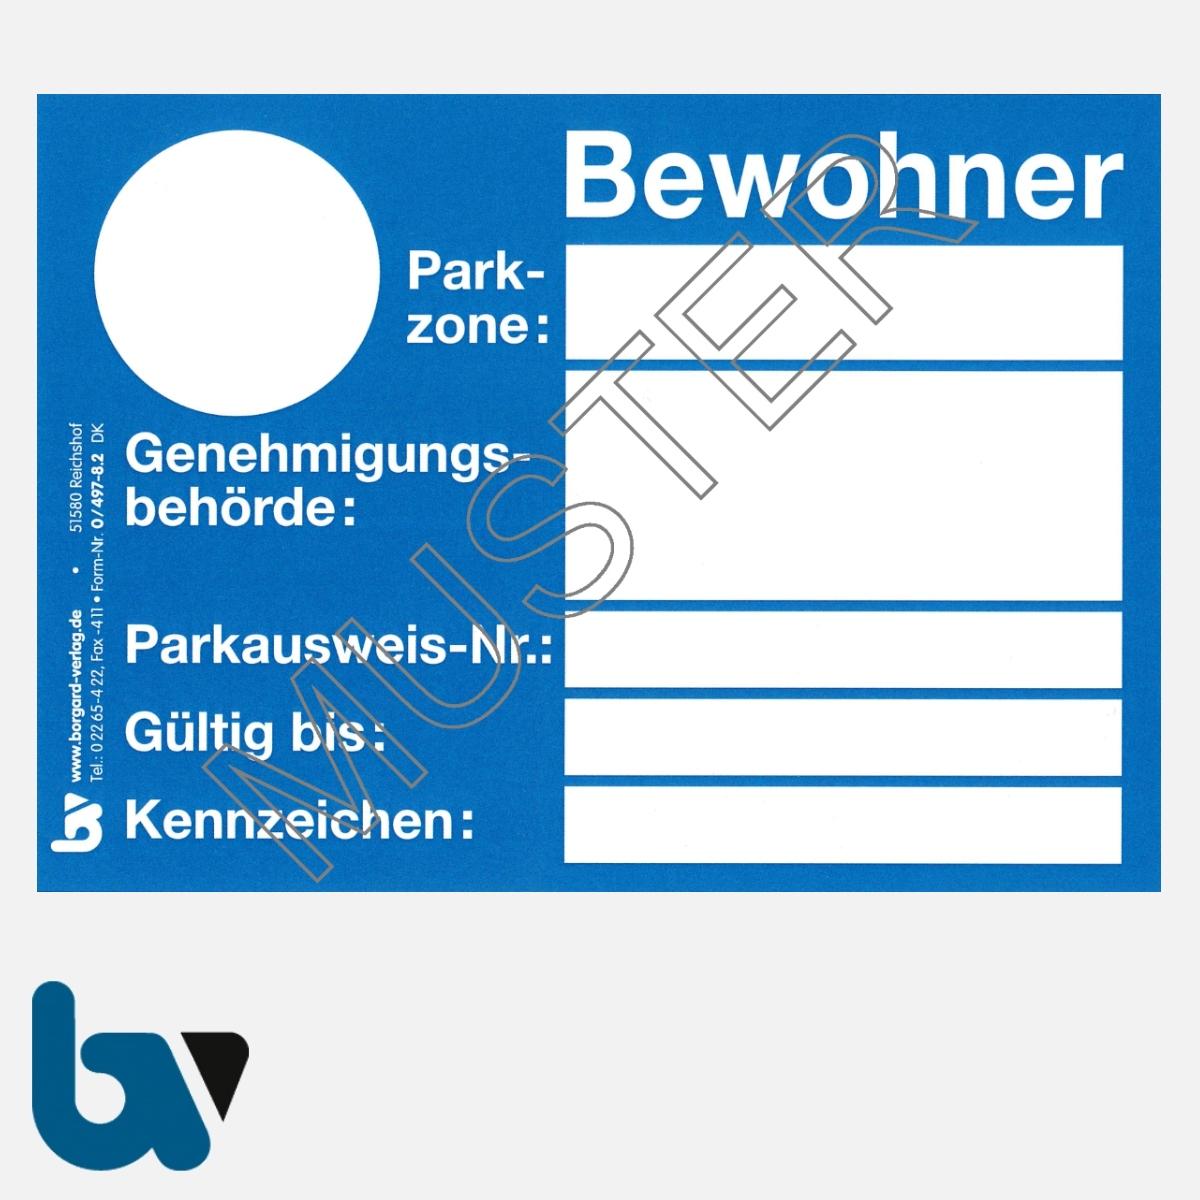 Borgard Verlag Shop Parkausweis Fur Bewohner Blau